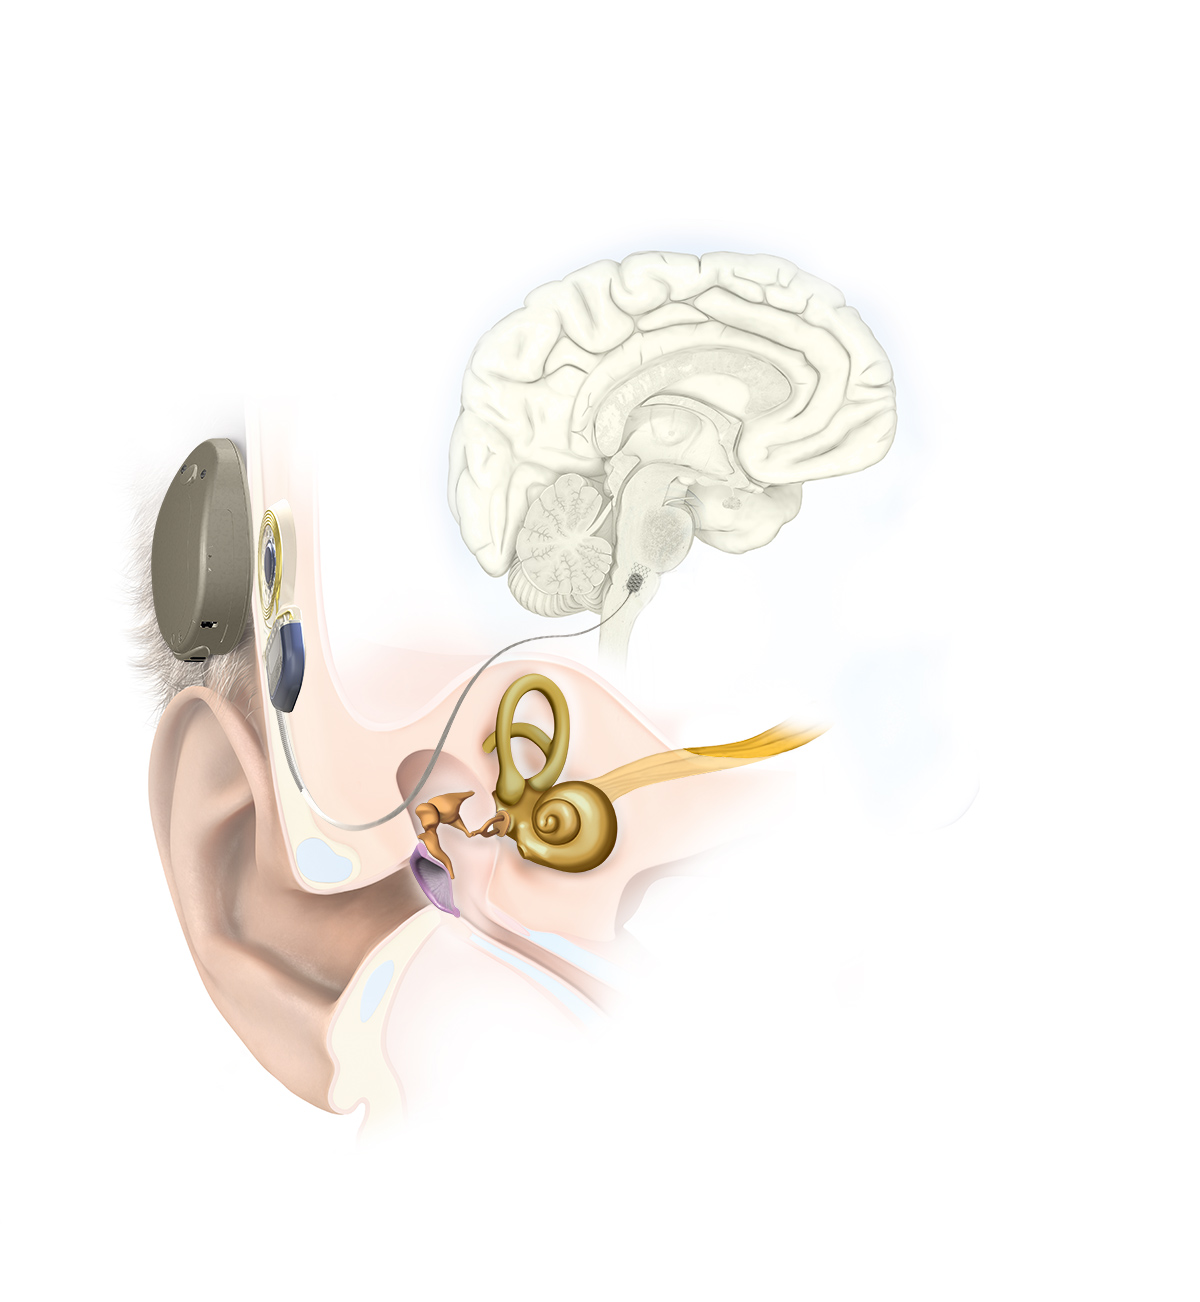 Auditory Brainstem Implant Illustration